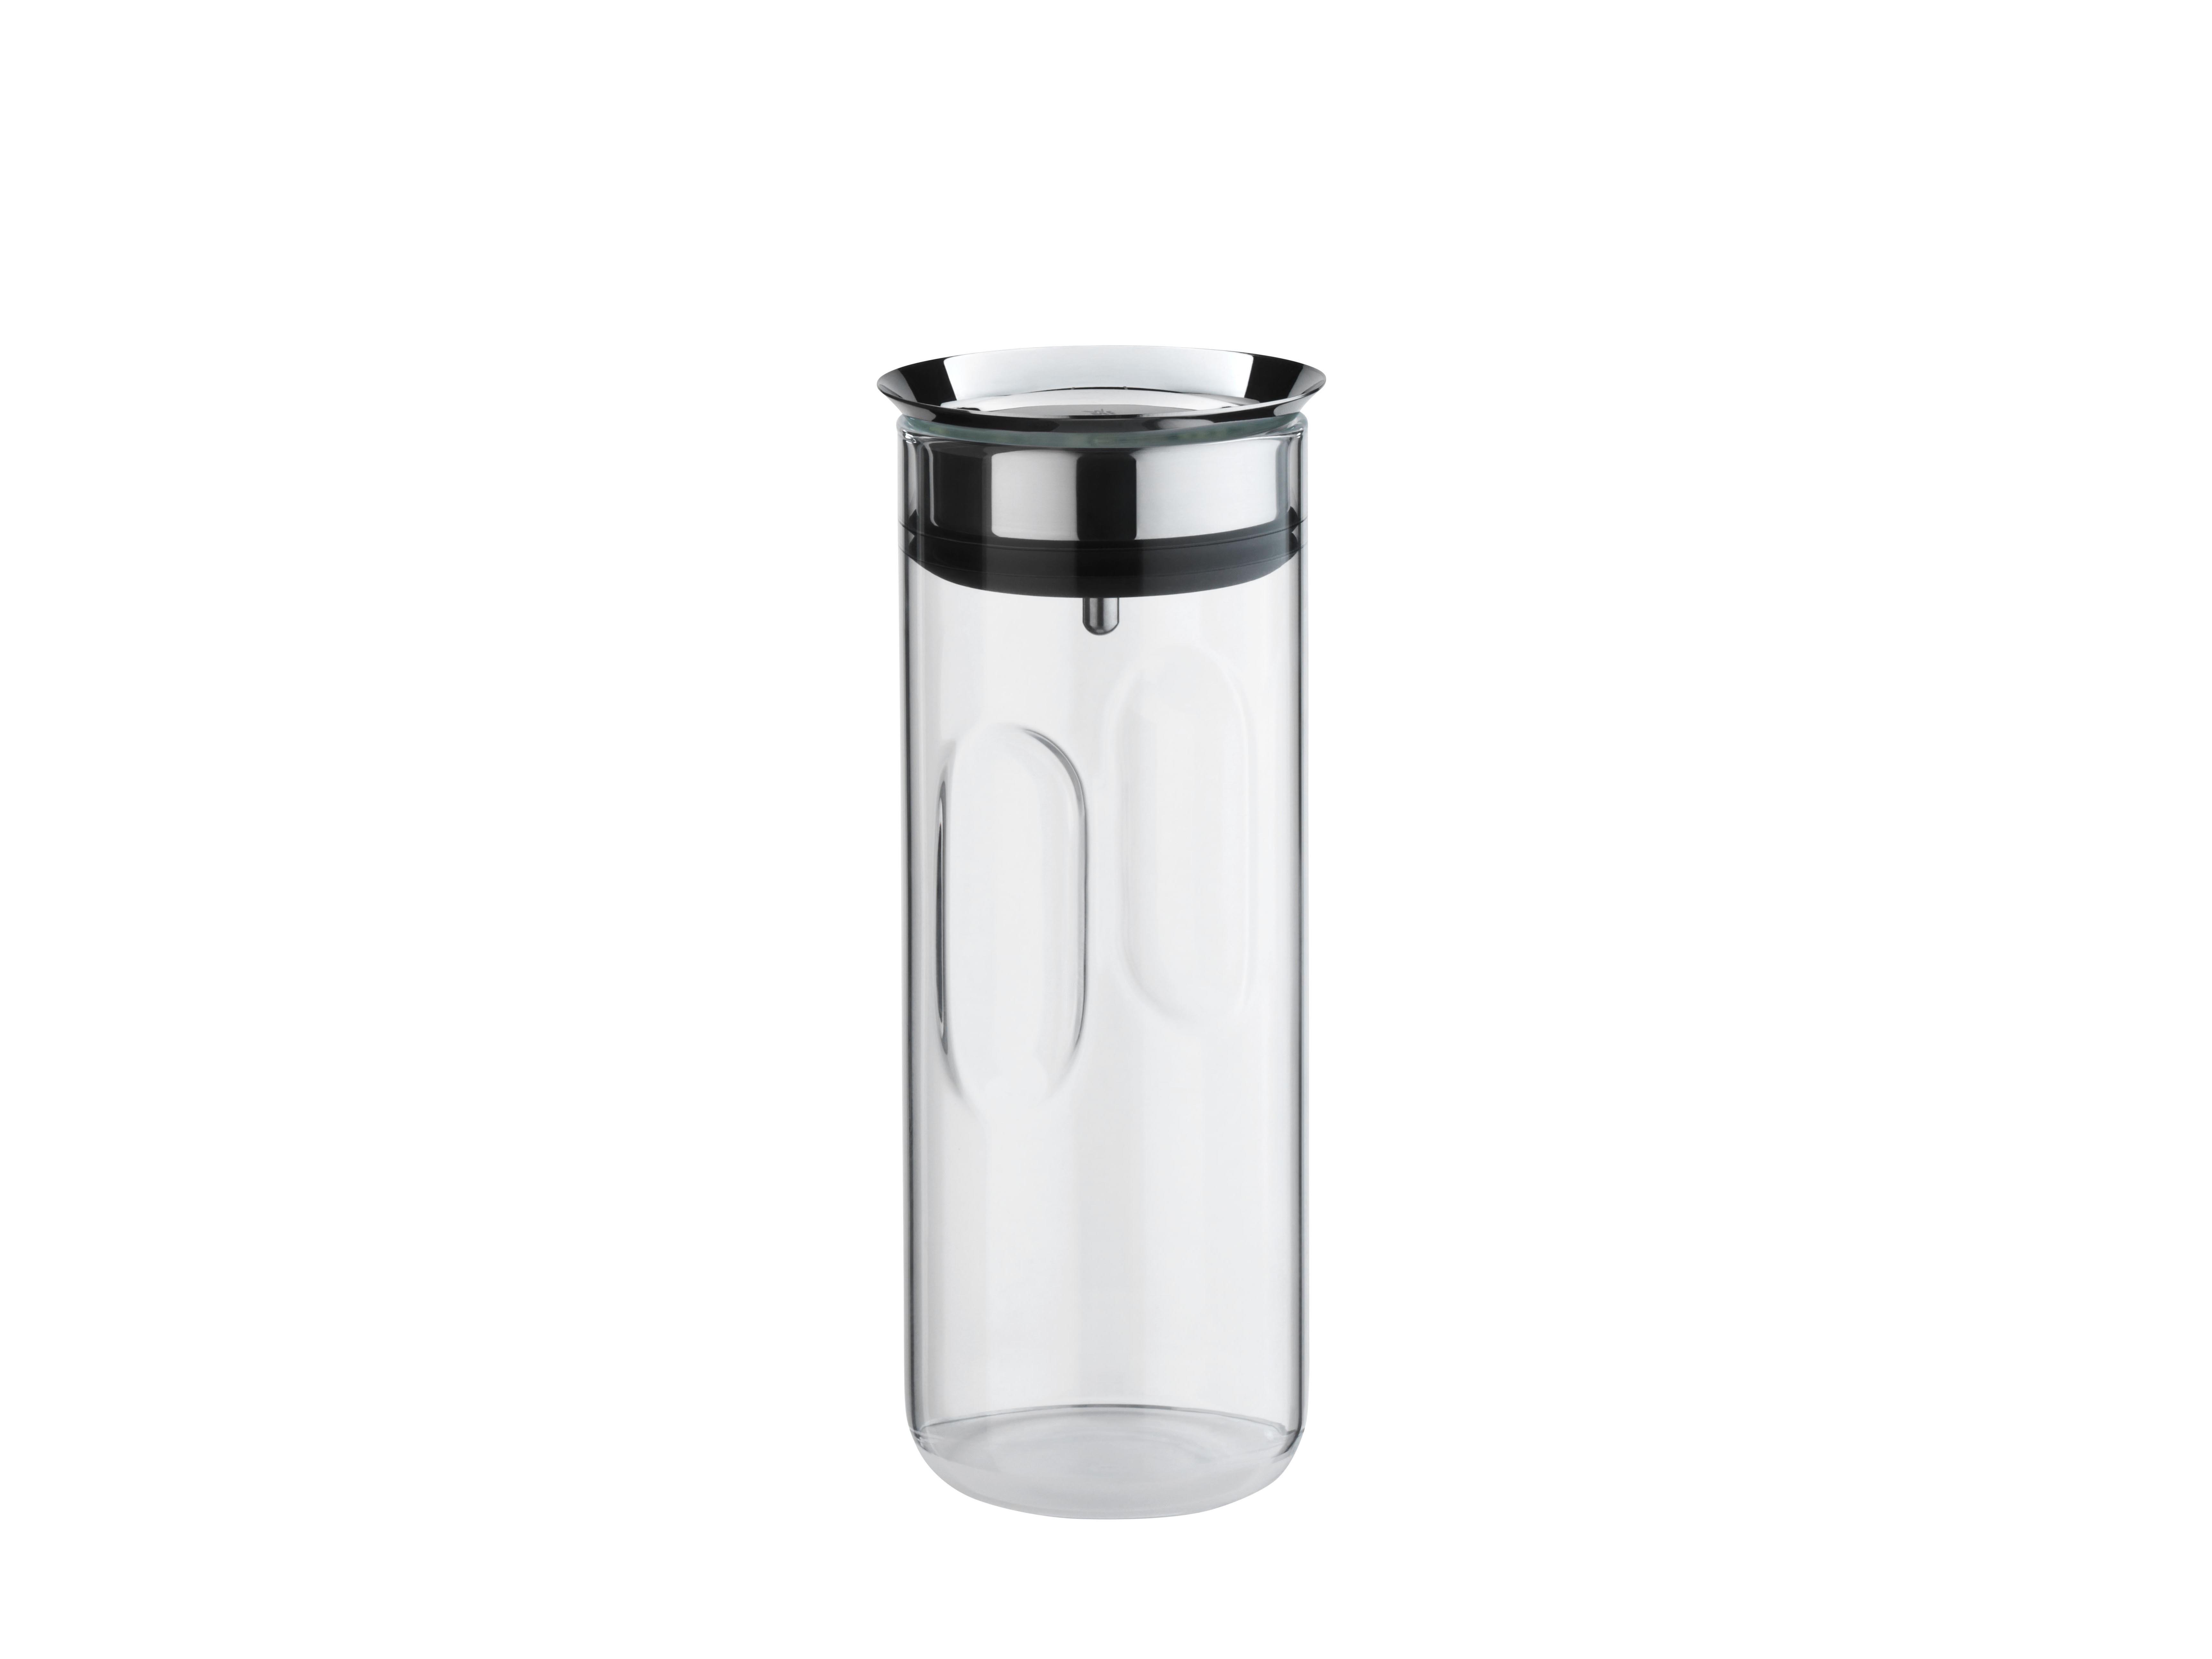 Karafka do wody WMF Motion Silver/Transparent 0,8 L